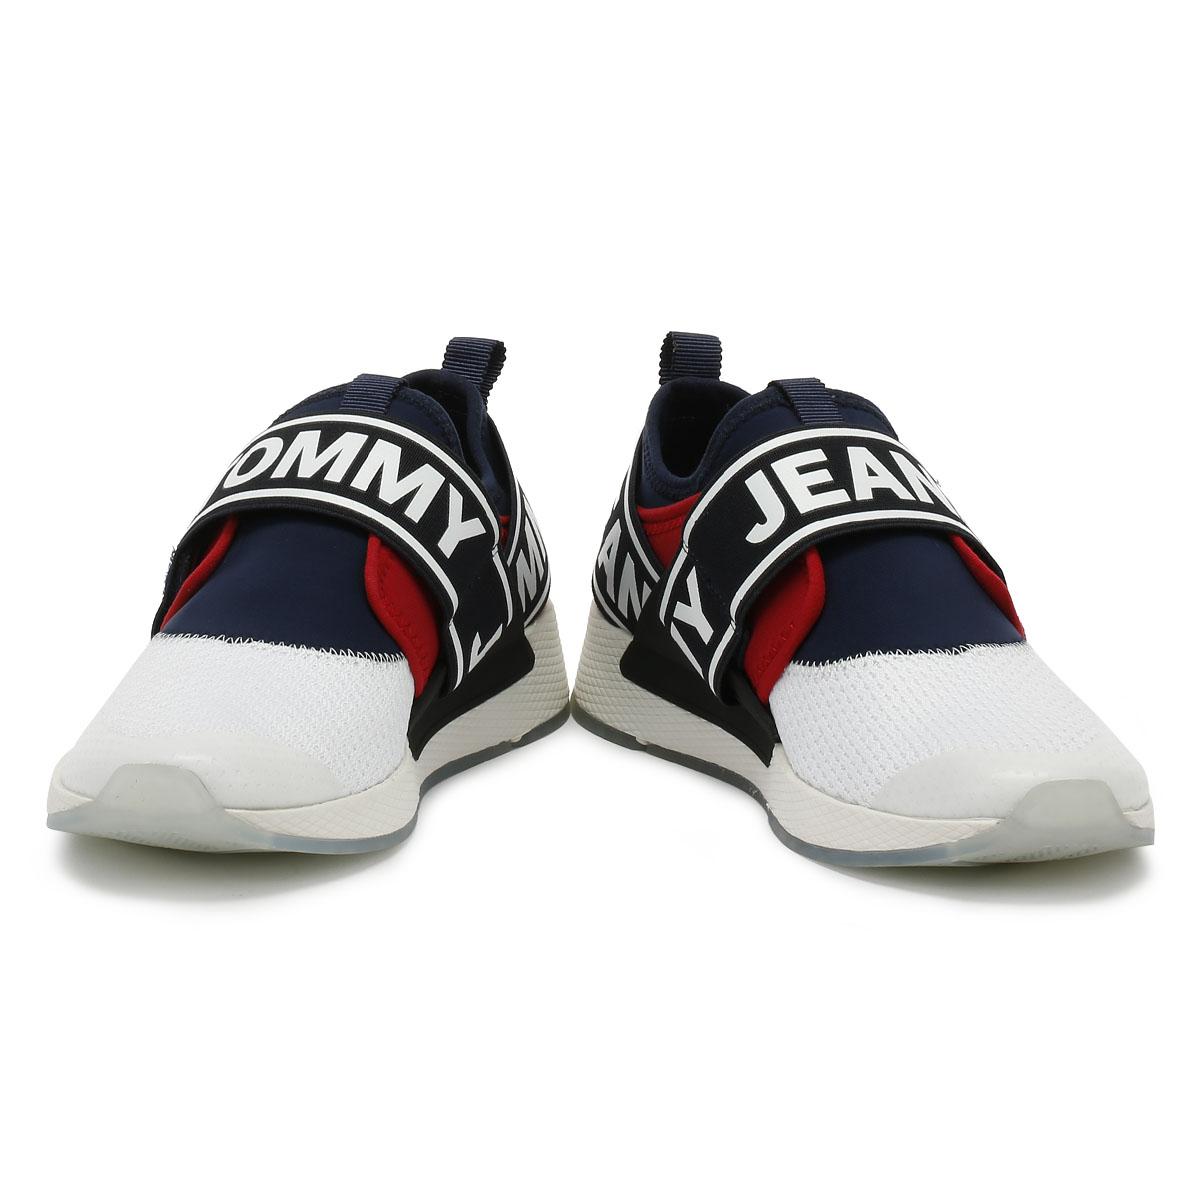 6c8f7e16a972c Tommy Jeans Flexi Mens RWB Trainers Sport Casual Heel Loop Shoes